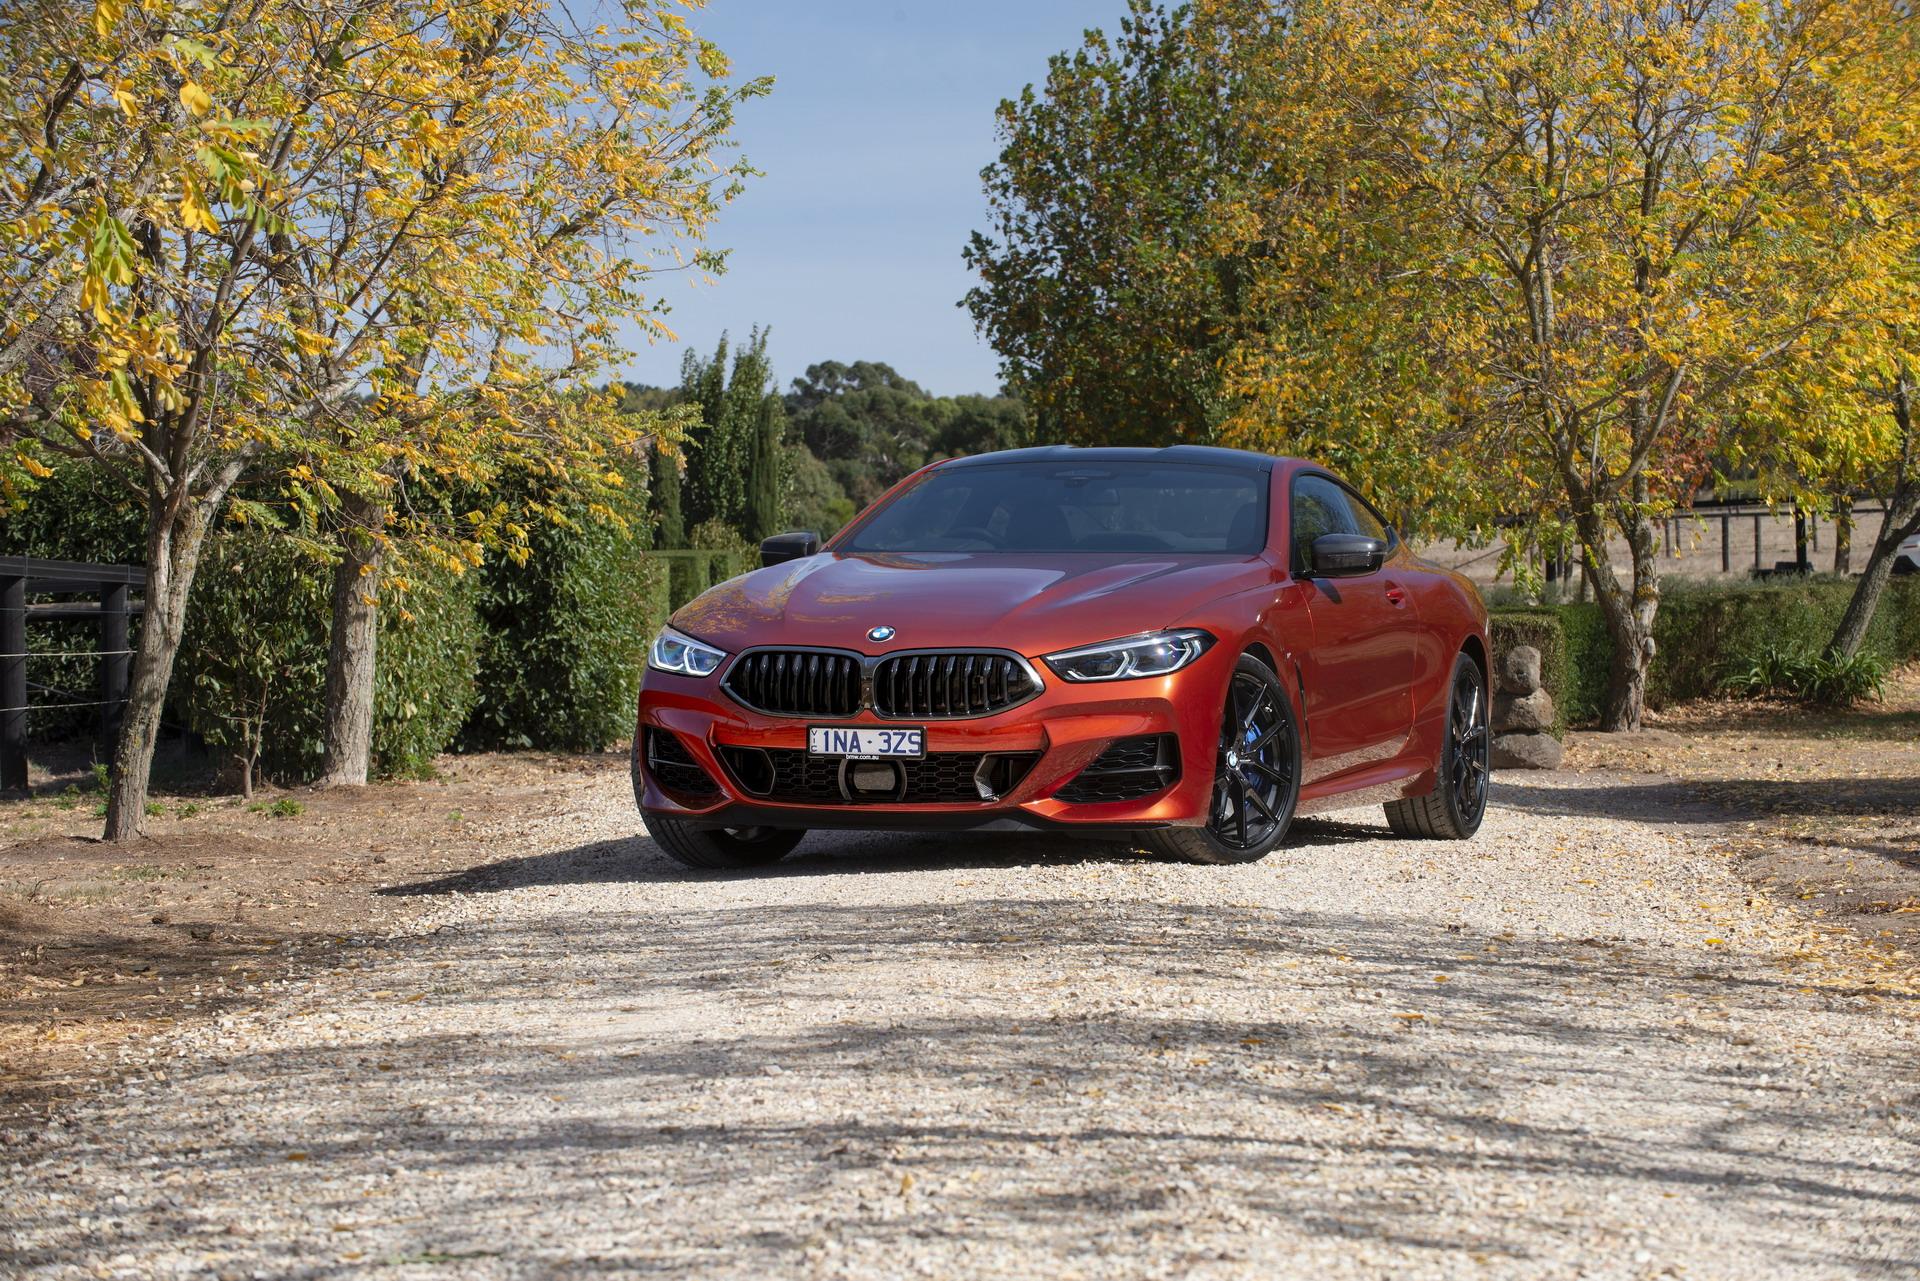 BMW M850i xDrive Coupe in Sunset Orange AU 55